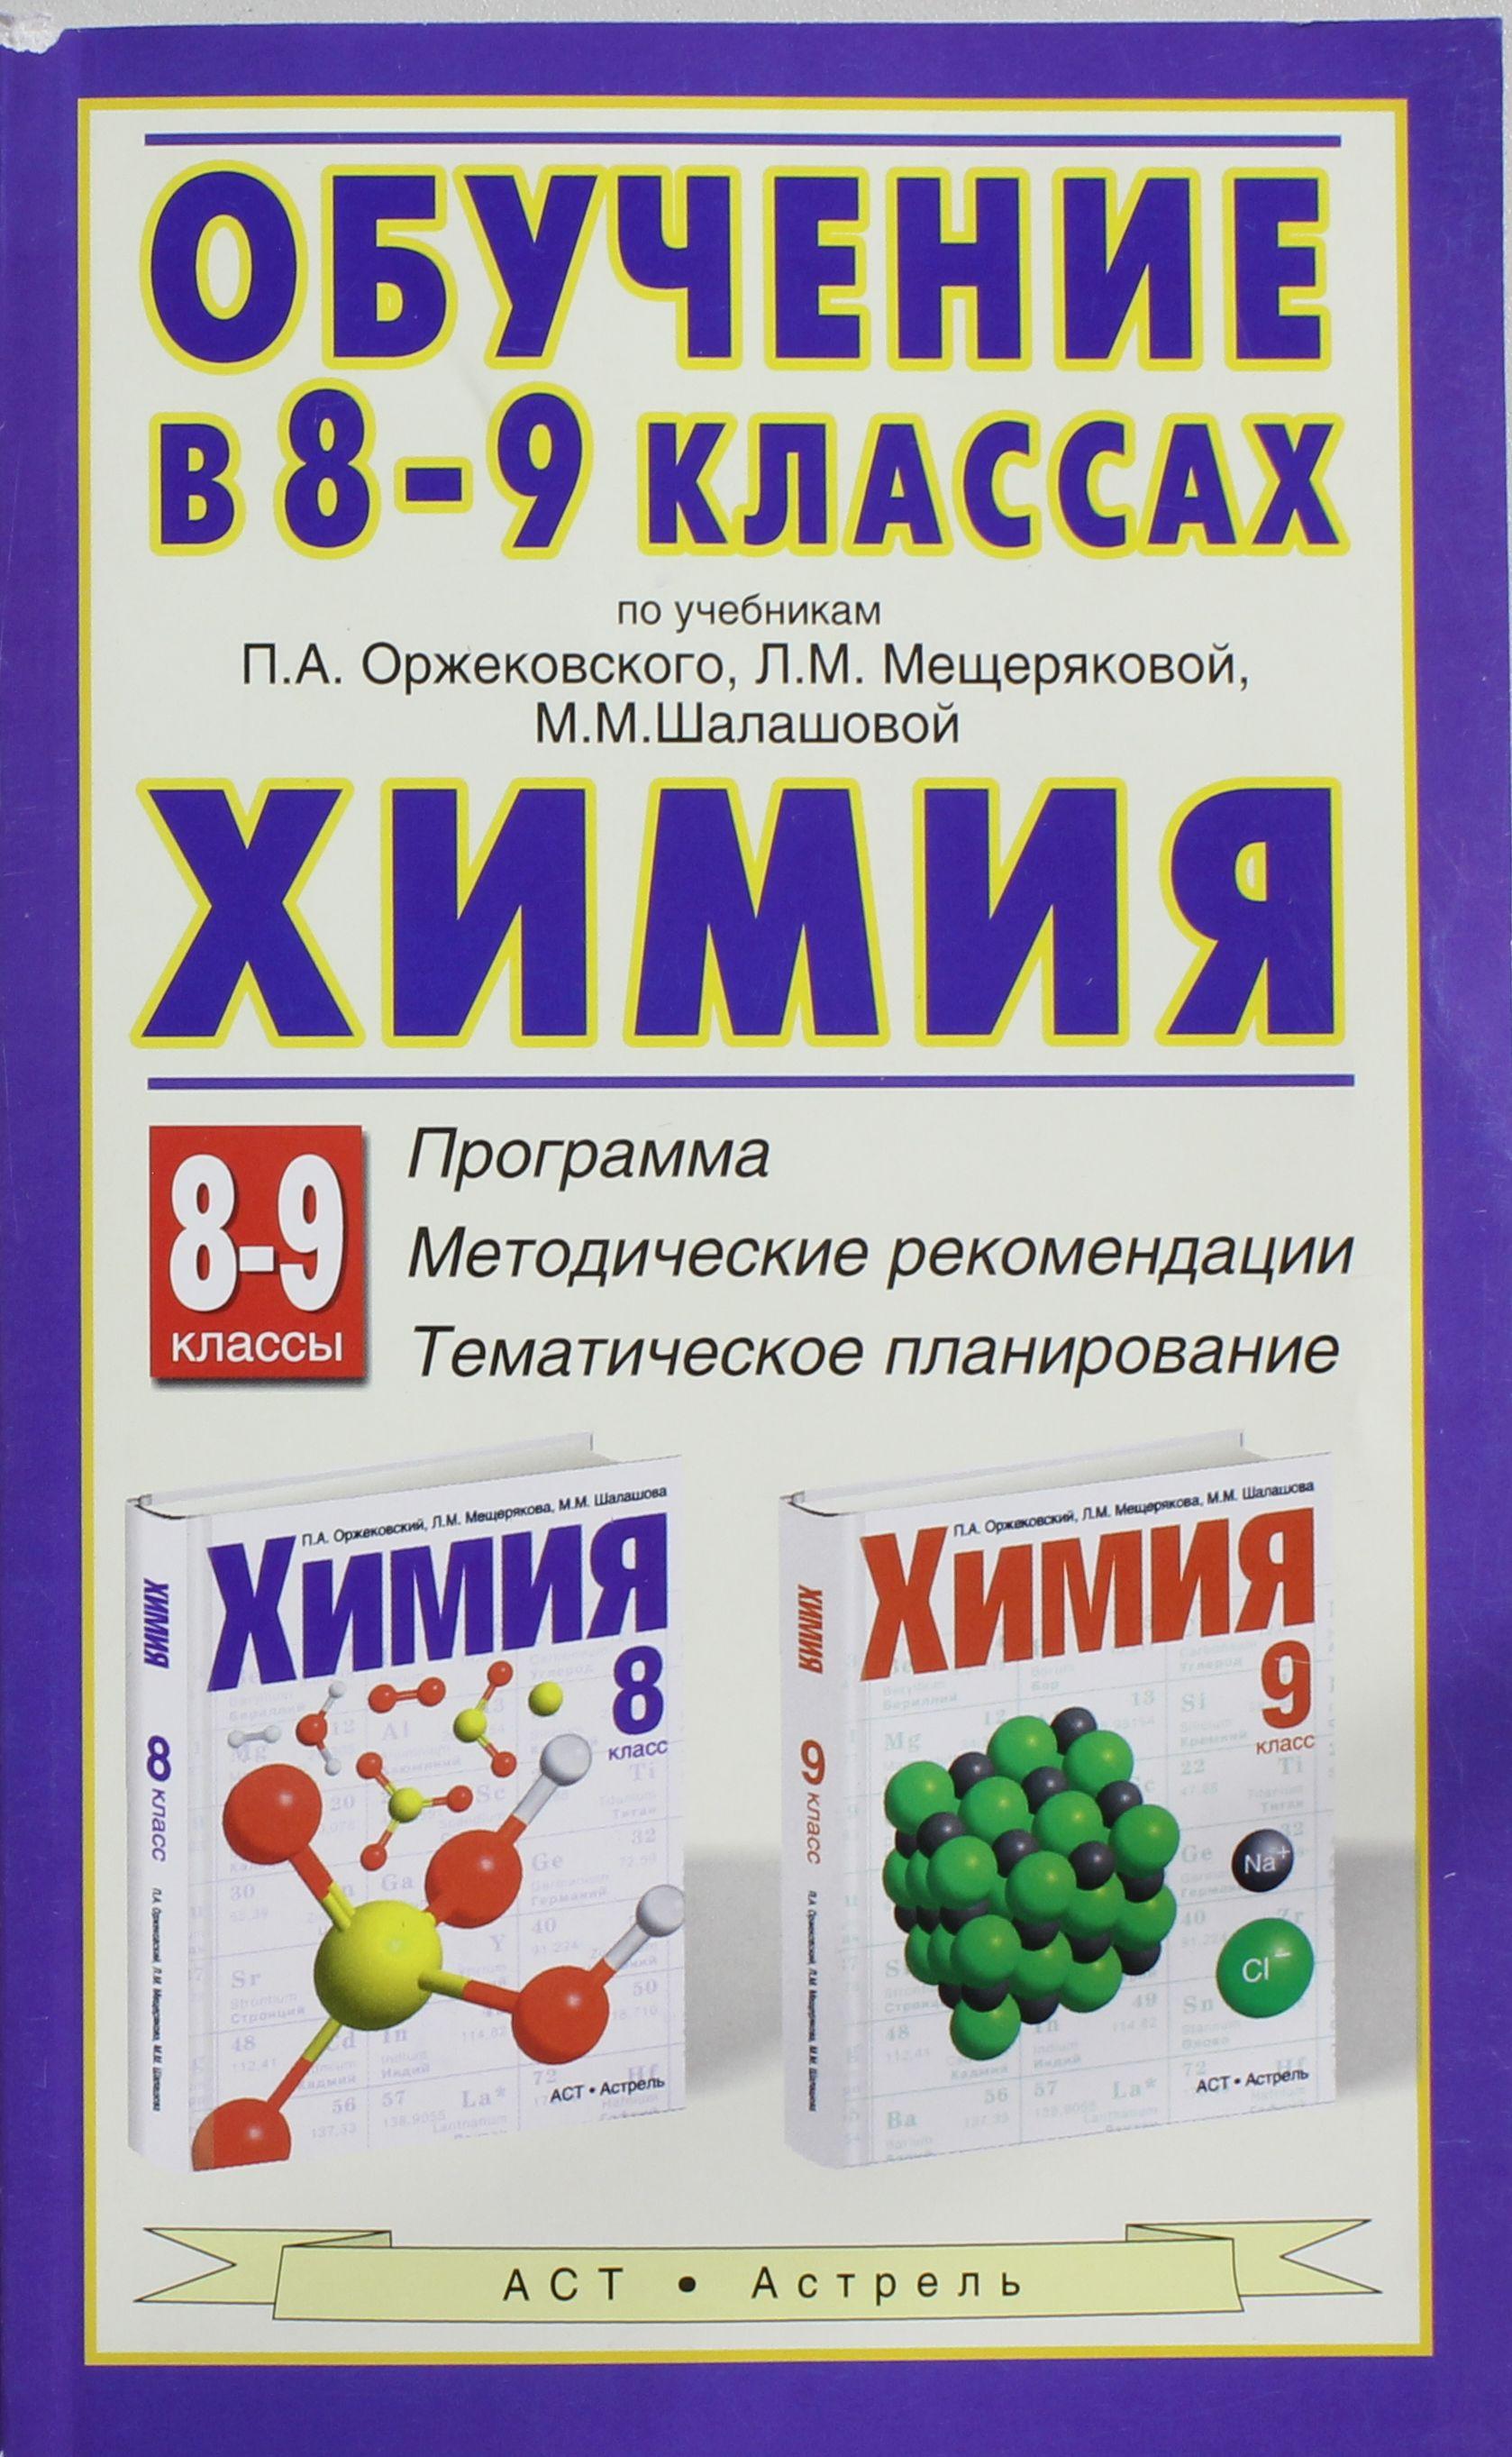 "Khimija. Obuchenie v 8-9 klassakh po uchebnikam P.A. Orzhekovskogo, L.M. Mescherjakovoj i M.M. Shalashovoj ""Khim"